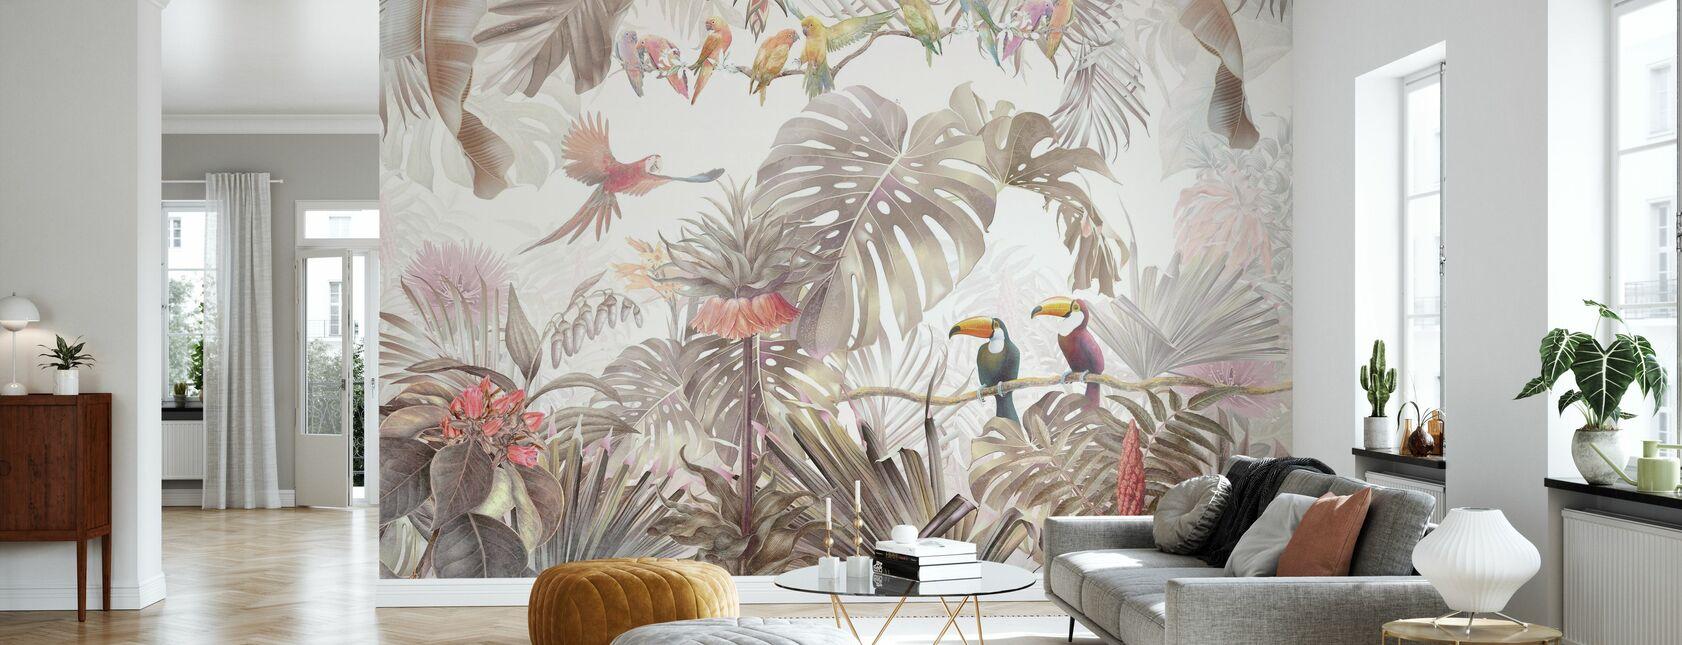 Tropical Birds - Wallpaper - Living Room